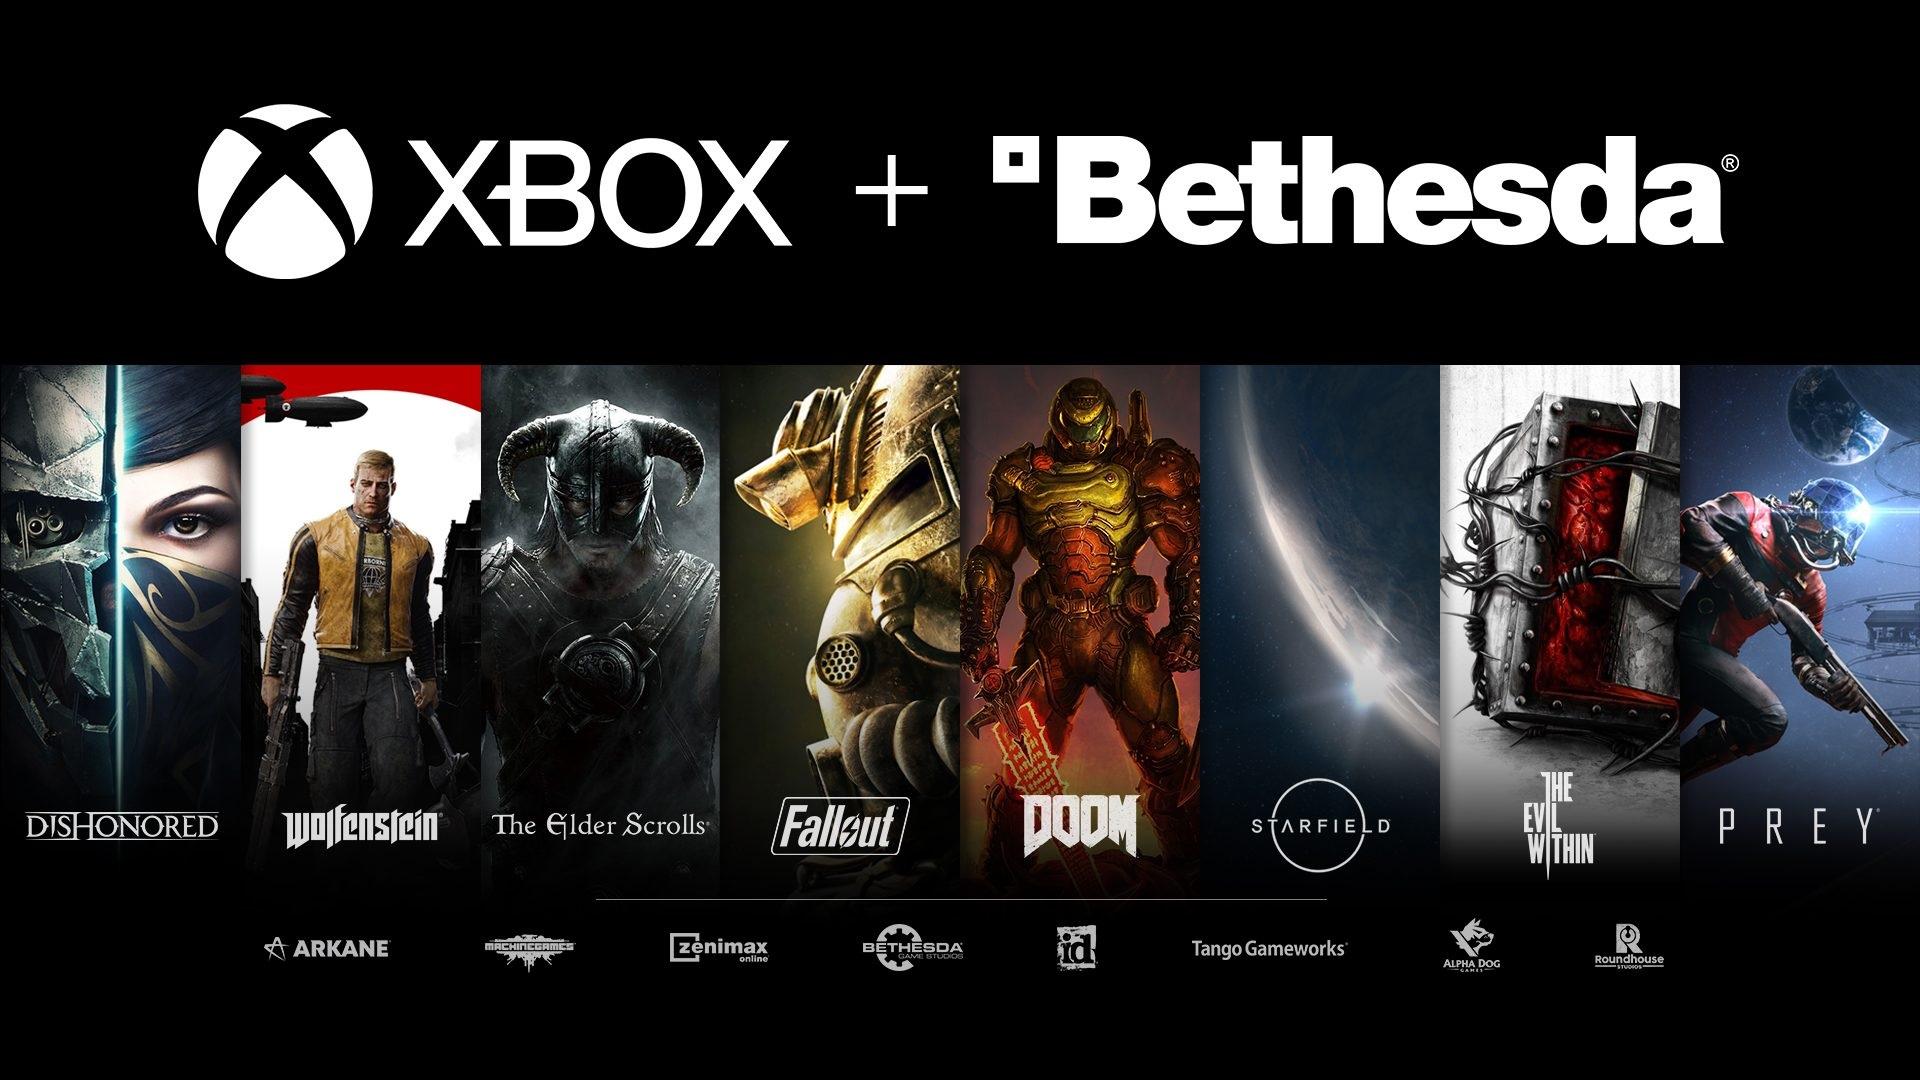 Xbox Bethesda; screenshot: Xbox + Bethesda